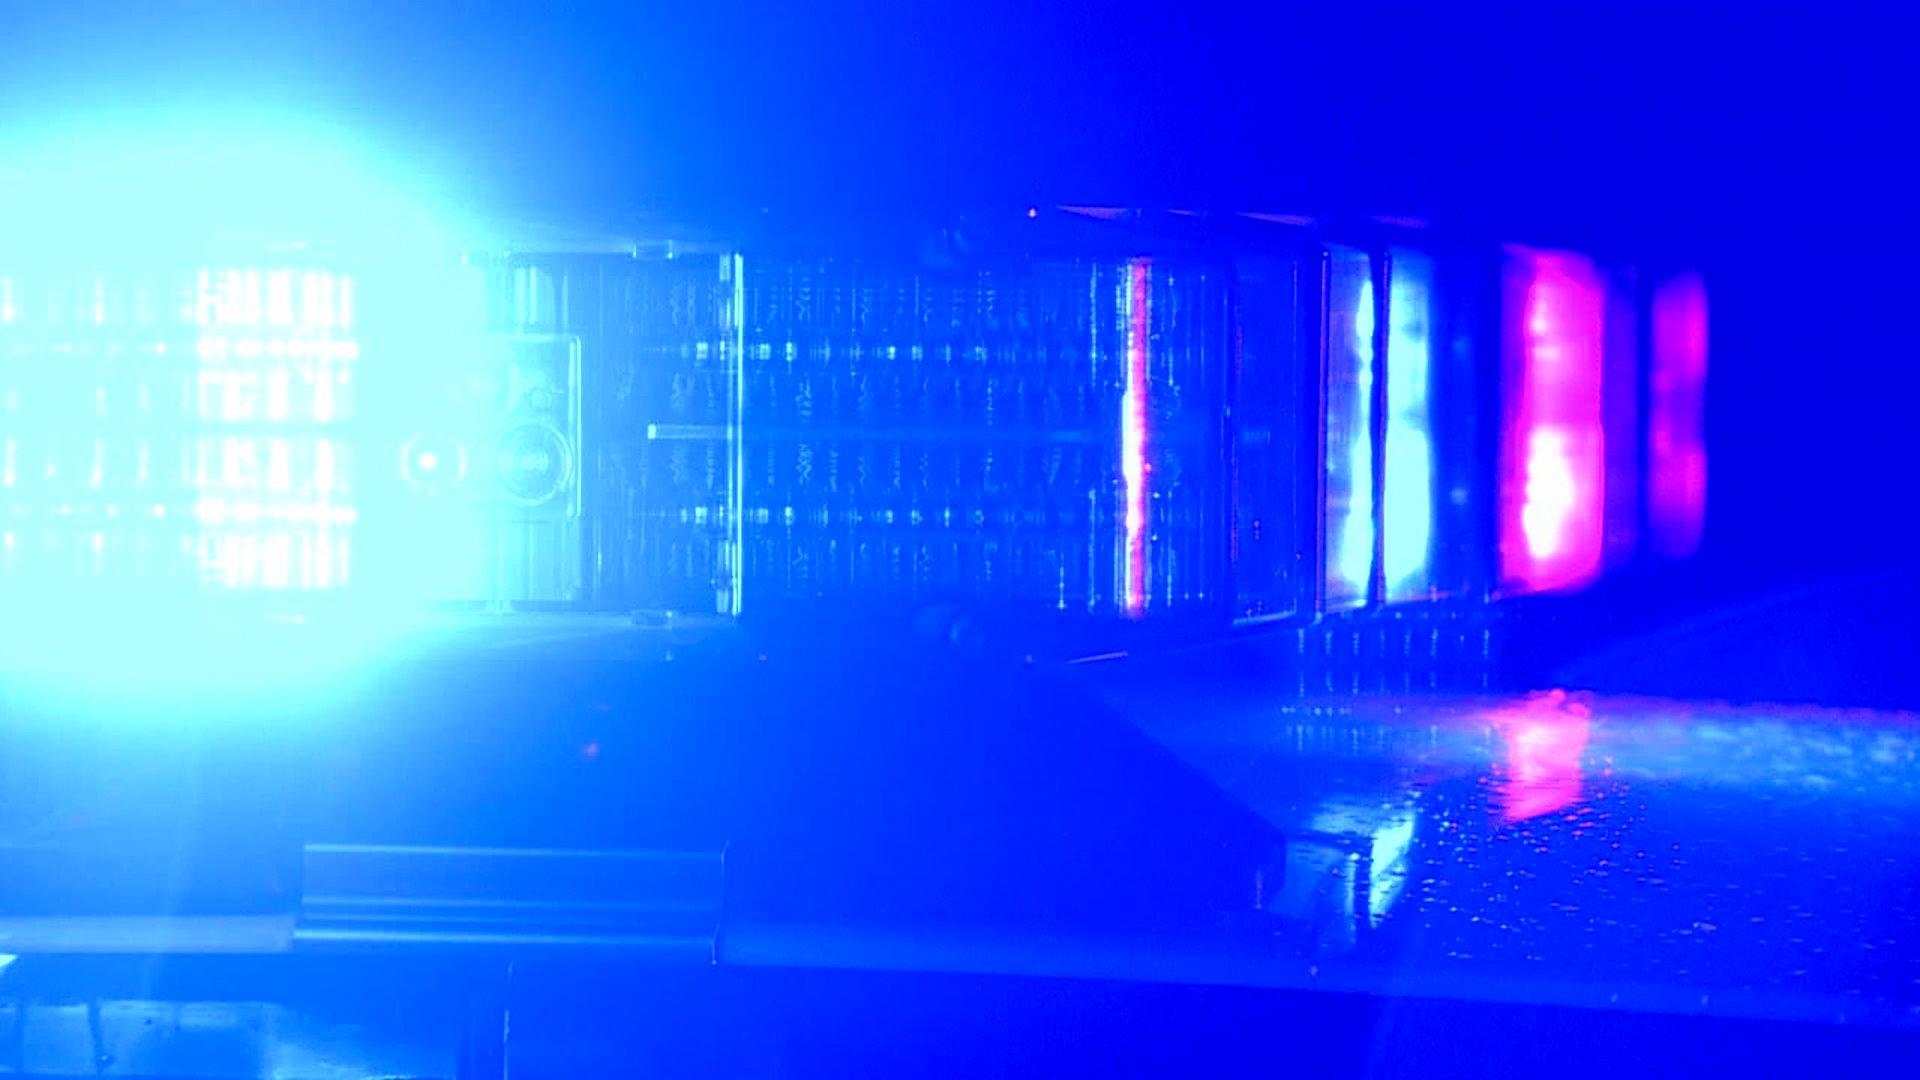 File photo of flashing police lights